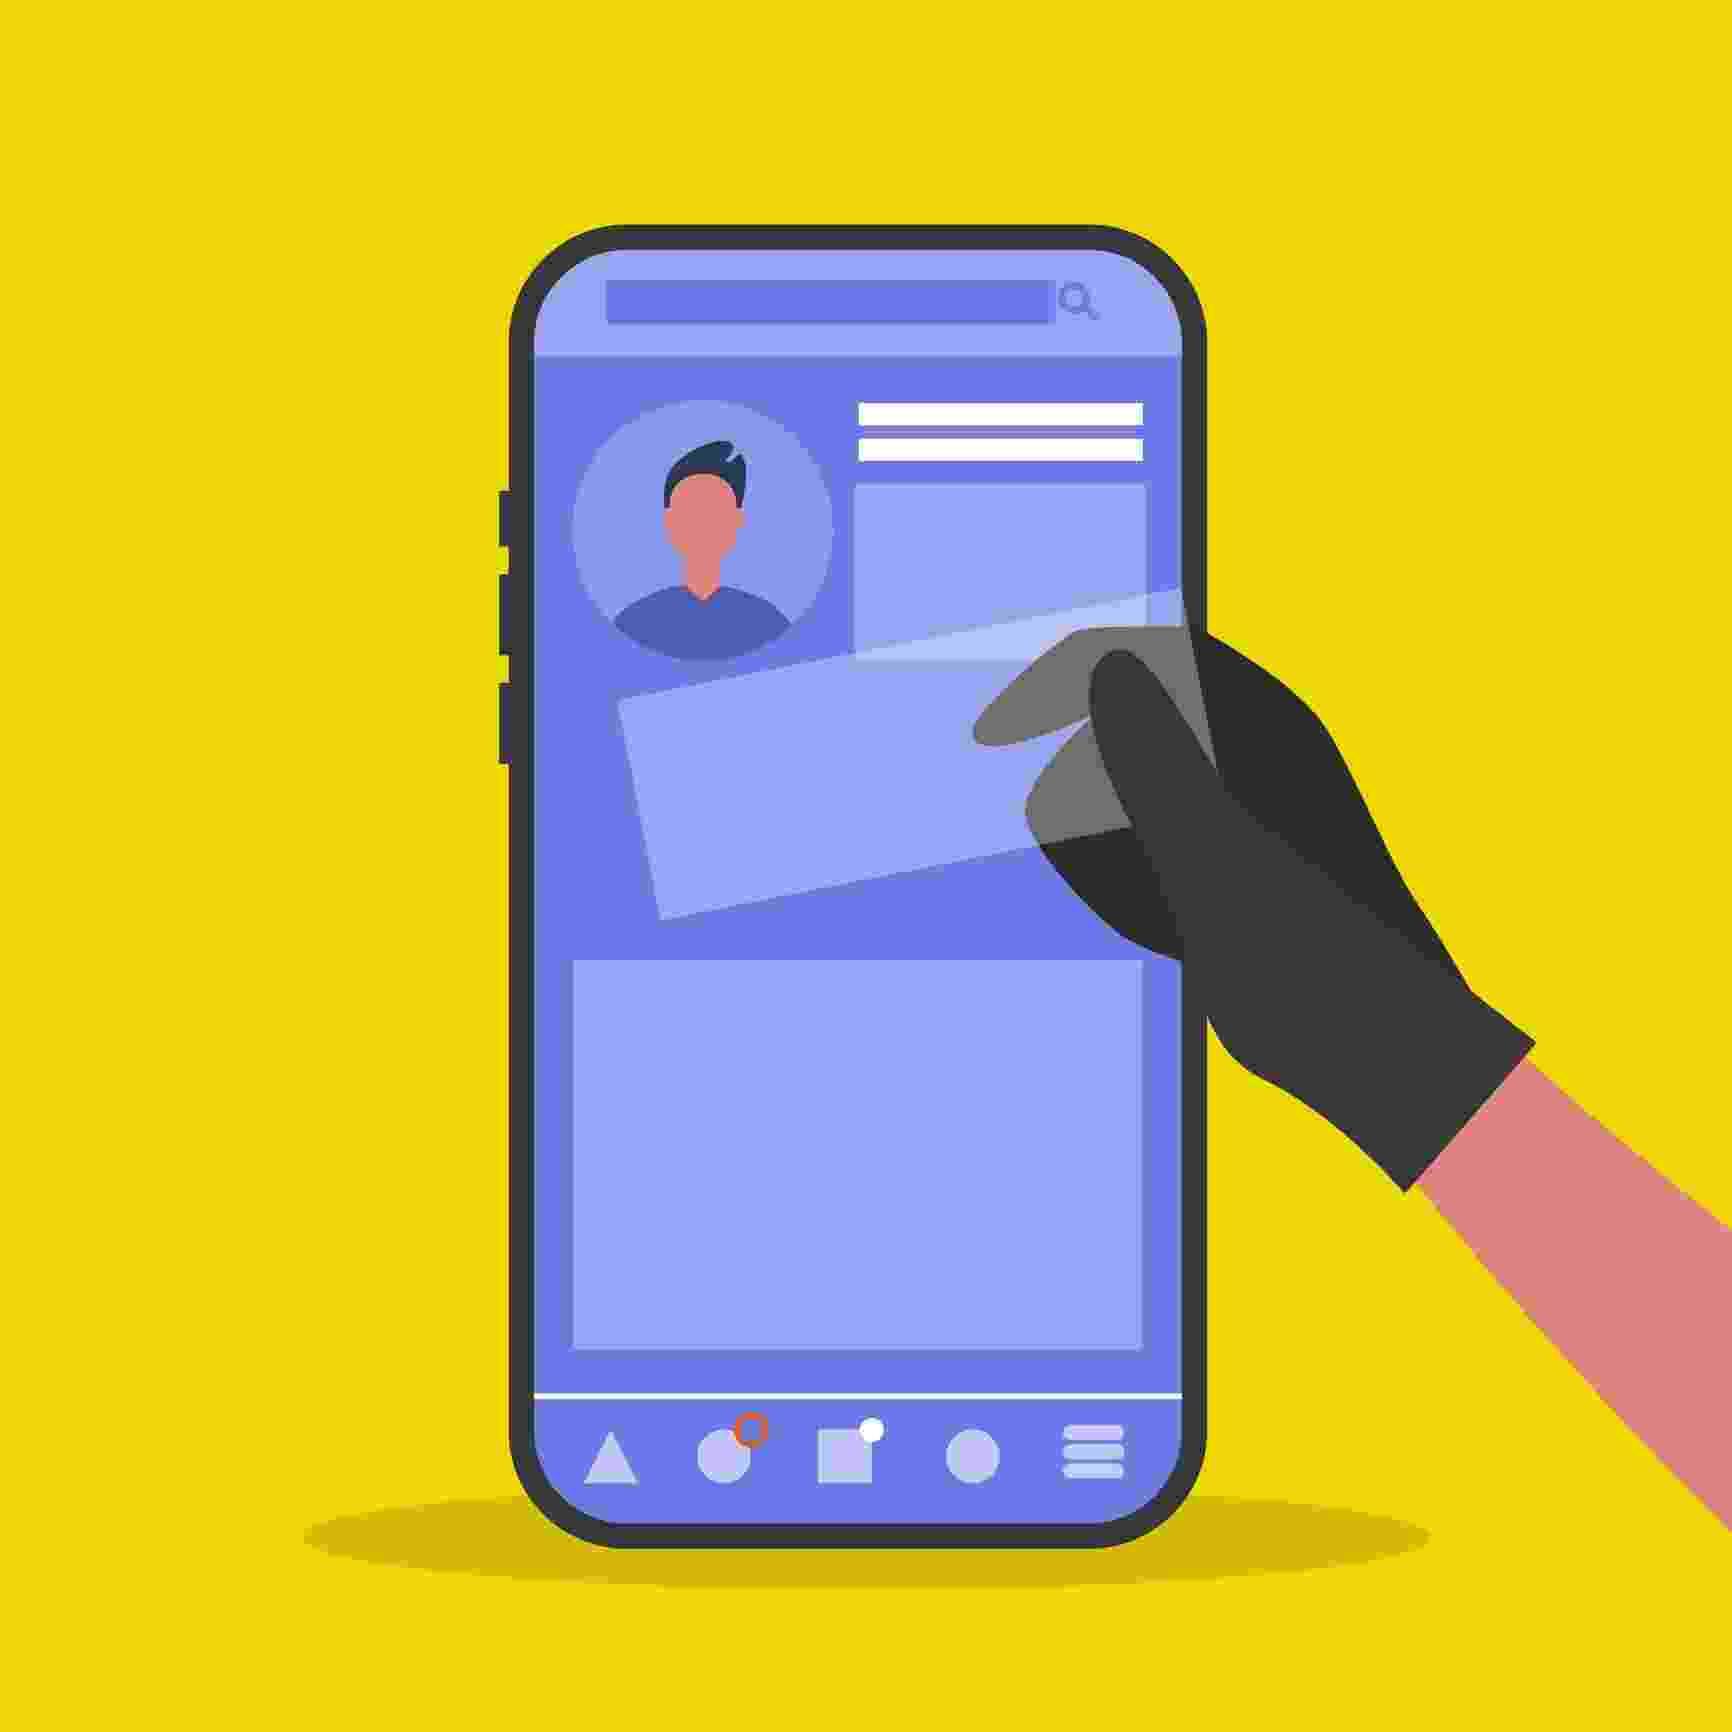 Fraude, roubo de dados, celular - Getty Images/iStockphoto